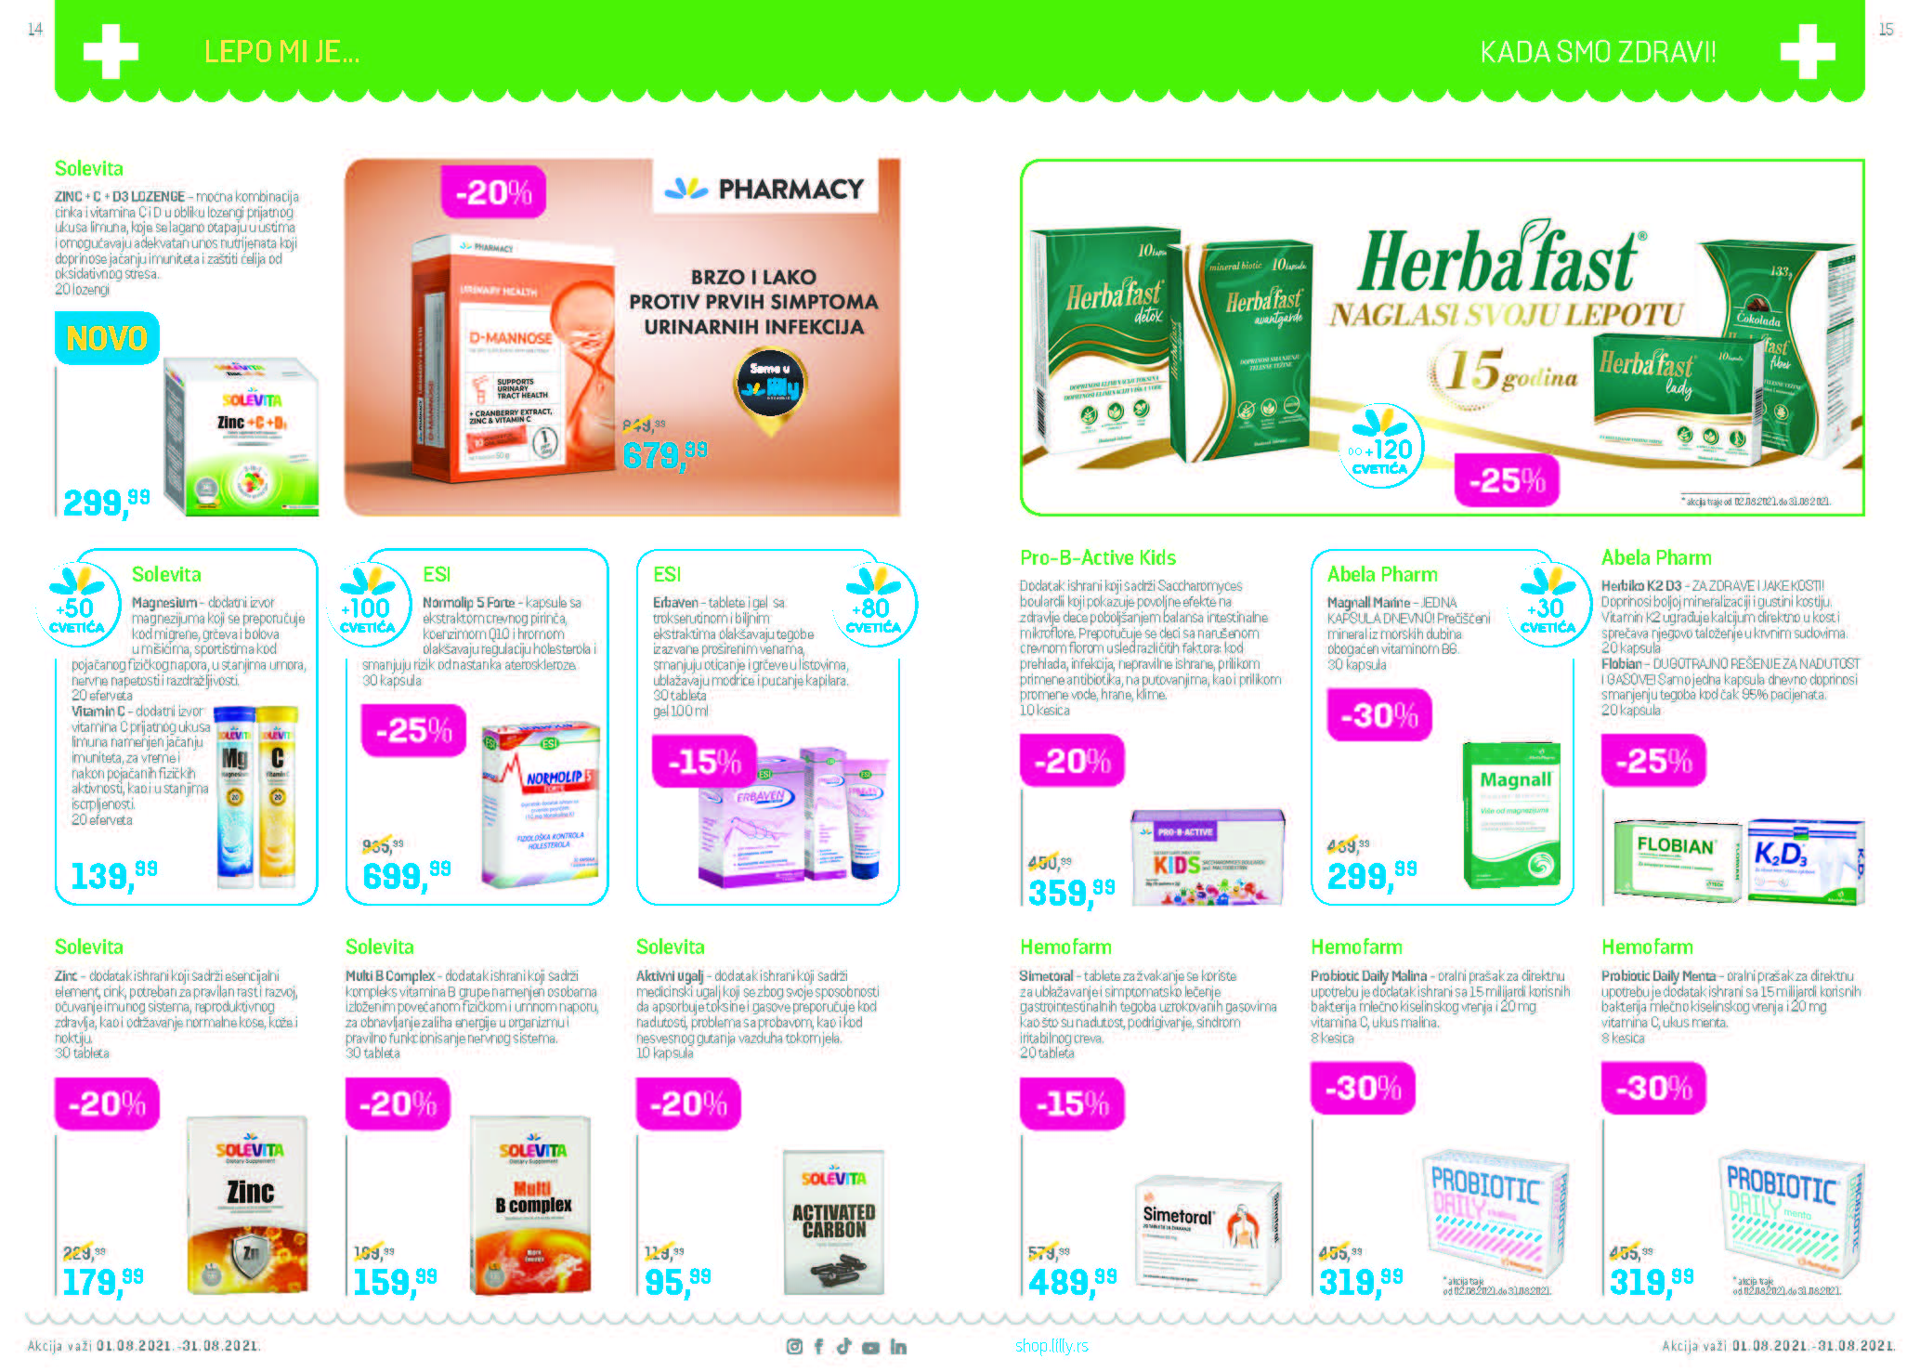 LILLY Katalog LILLY ONLINE AKCIJA AVGUST 2021 1.8. 31.8. Page 08